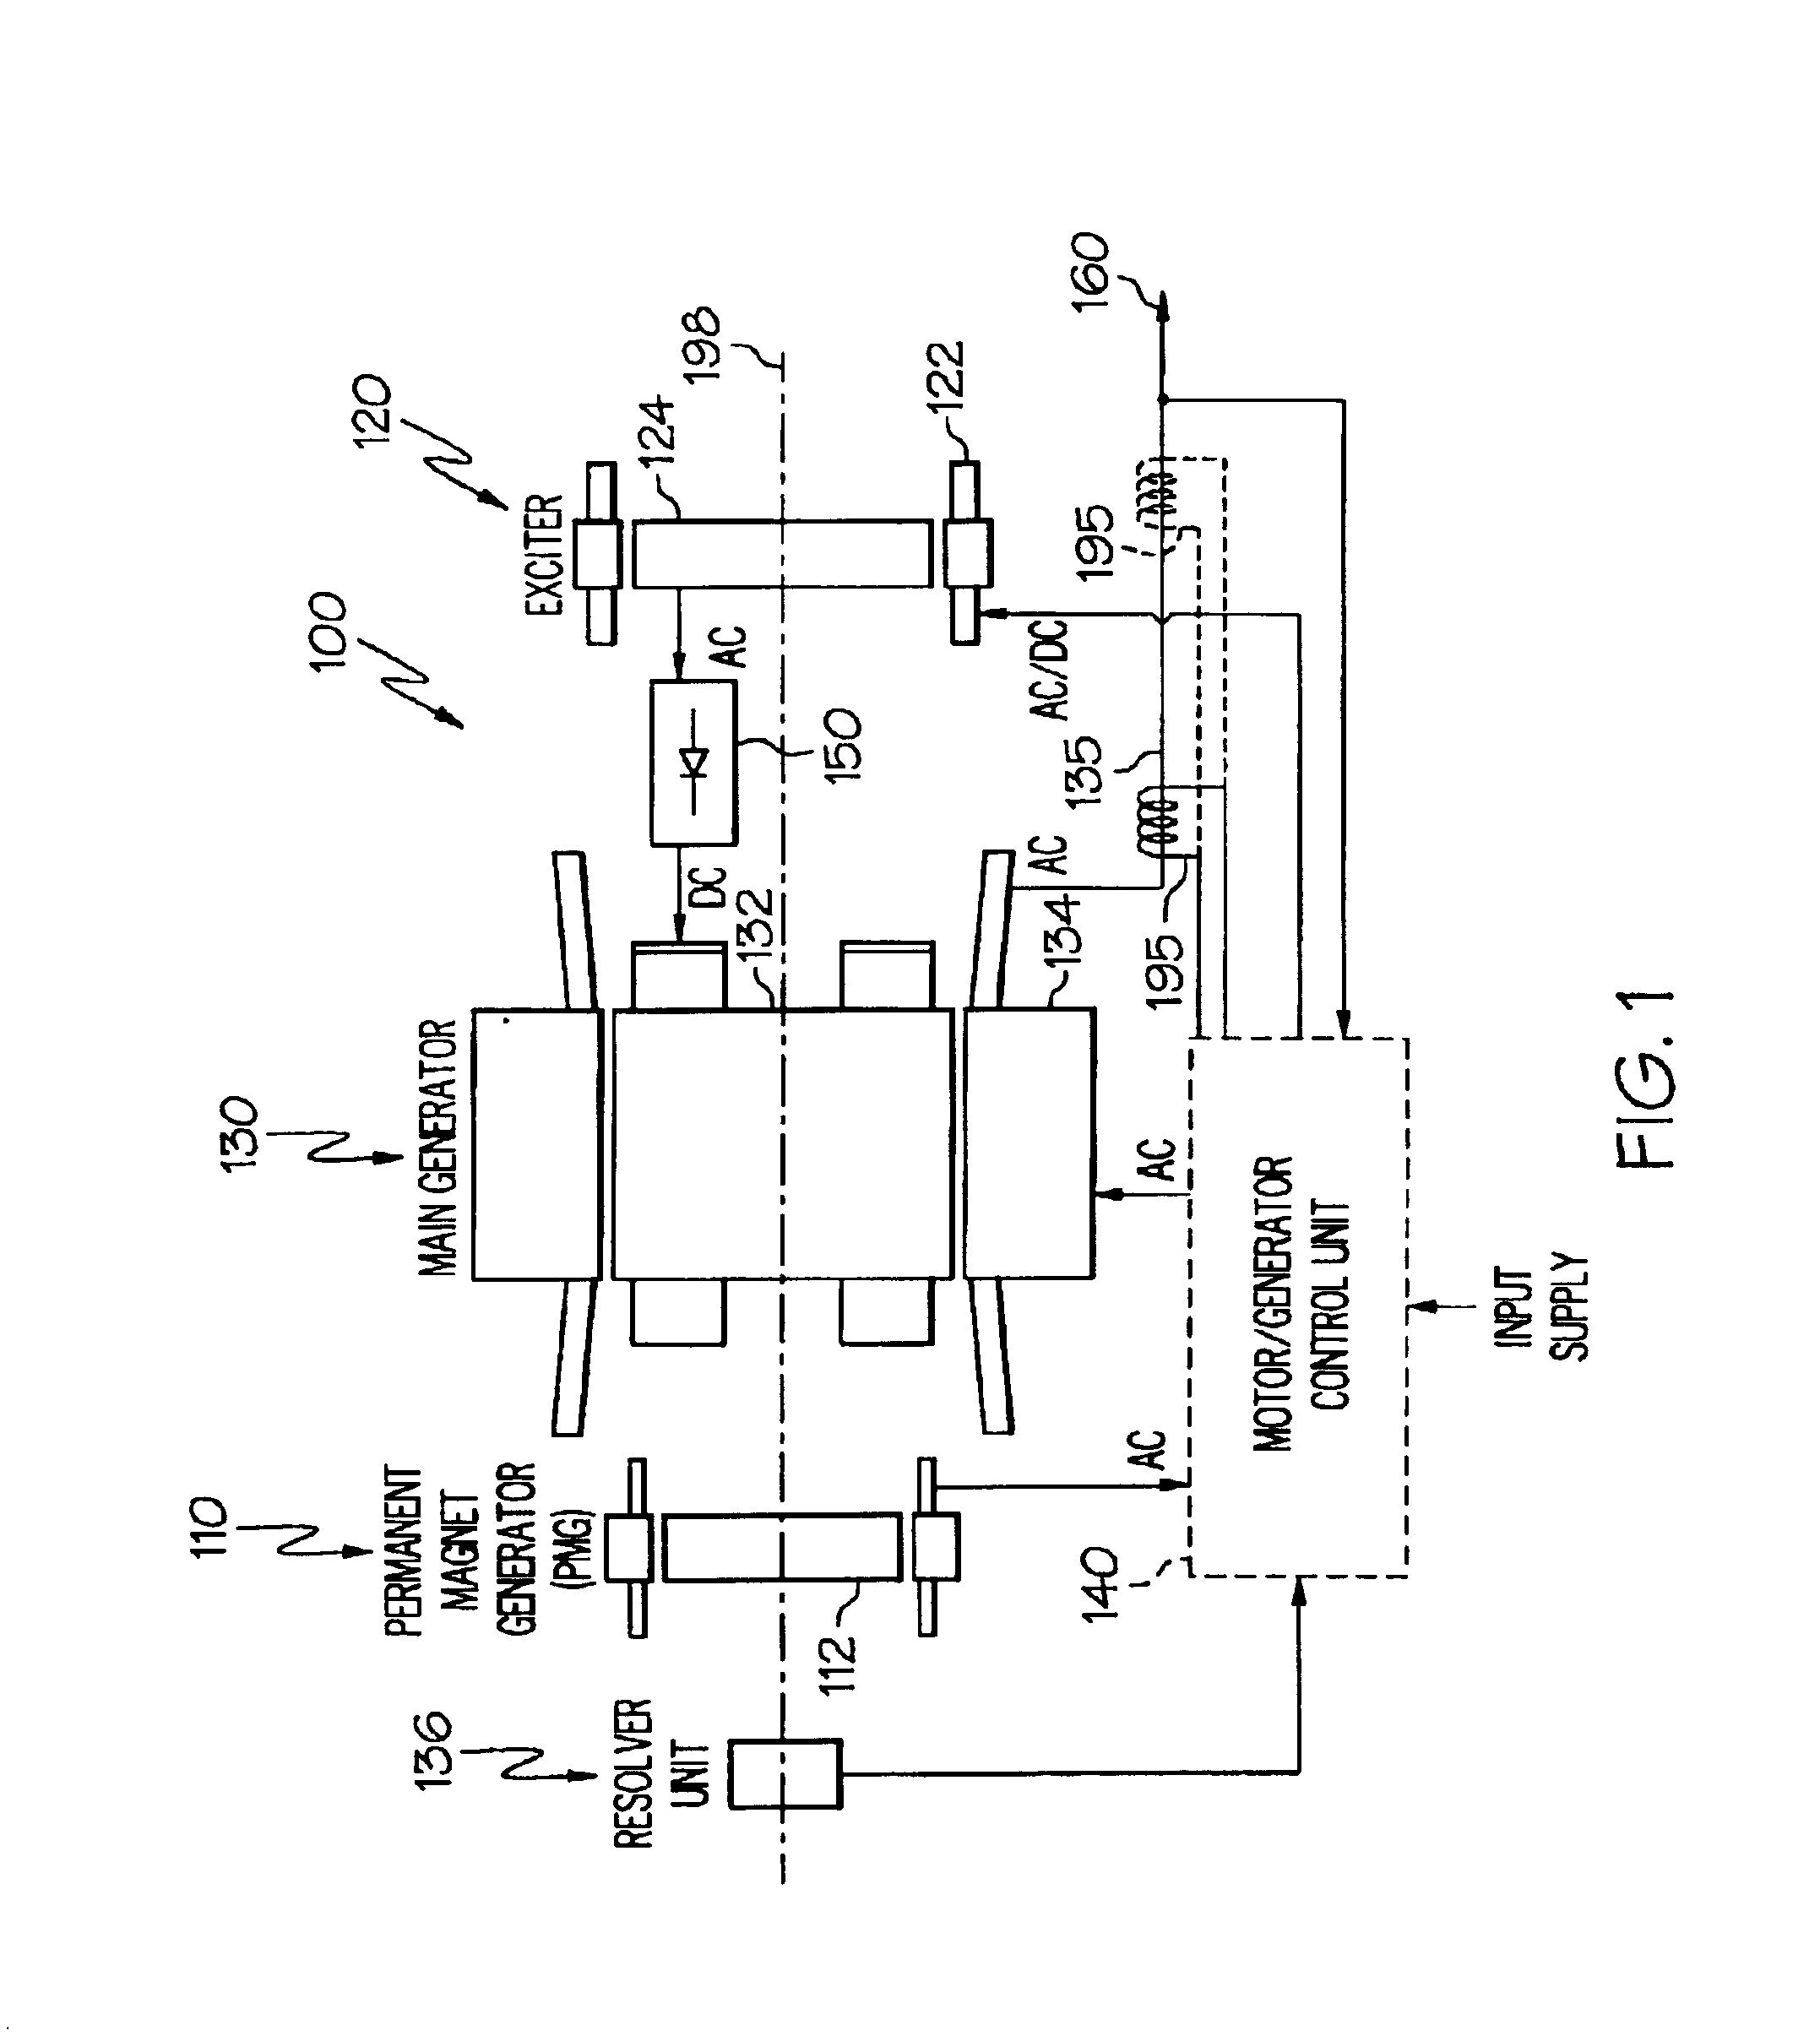 Small Motor Wiring Diagrams Single Phase Kohler 1 7841 Engine Starter Generator Diagram Solutions Gas Turbine Electric